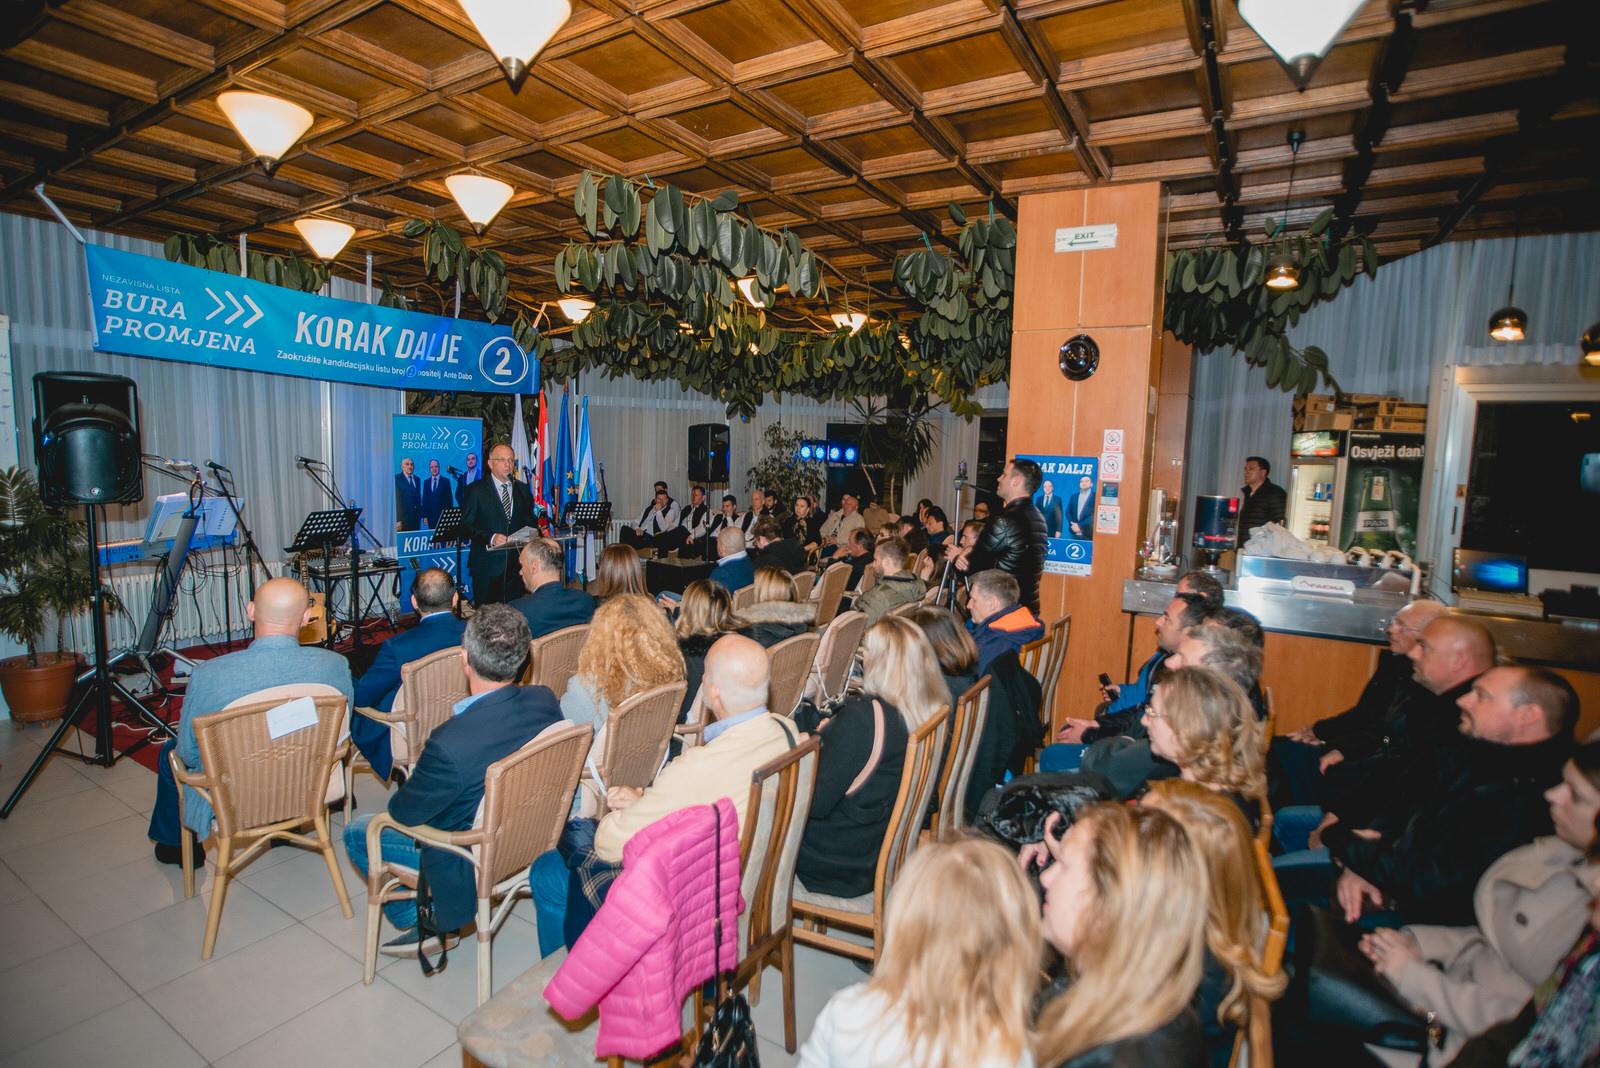 likaclub_bura-promjena_novalja_2019-34